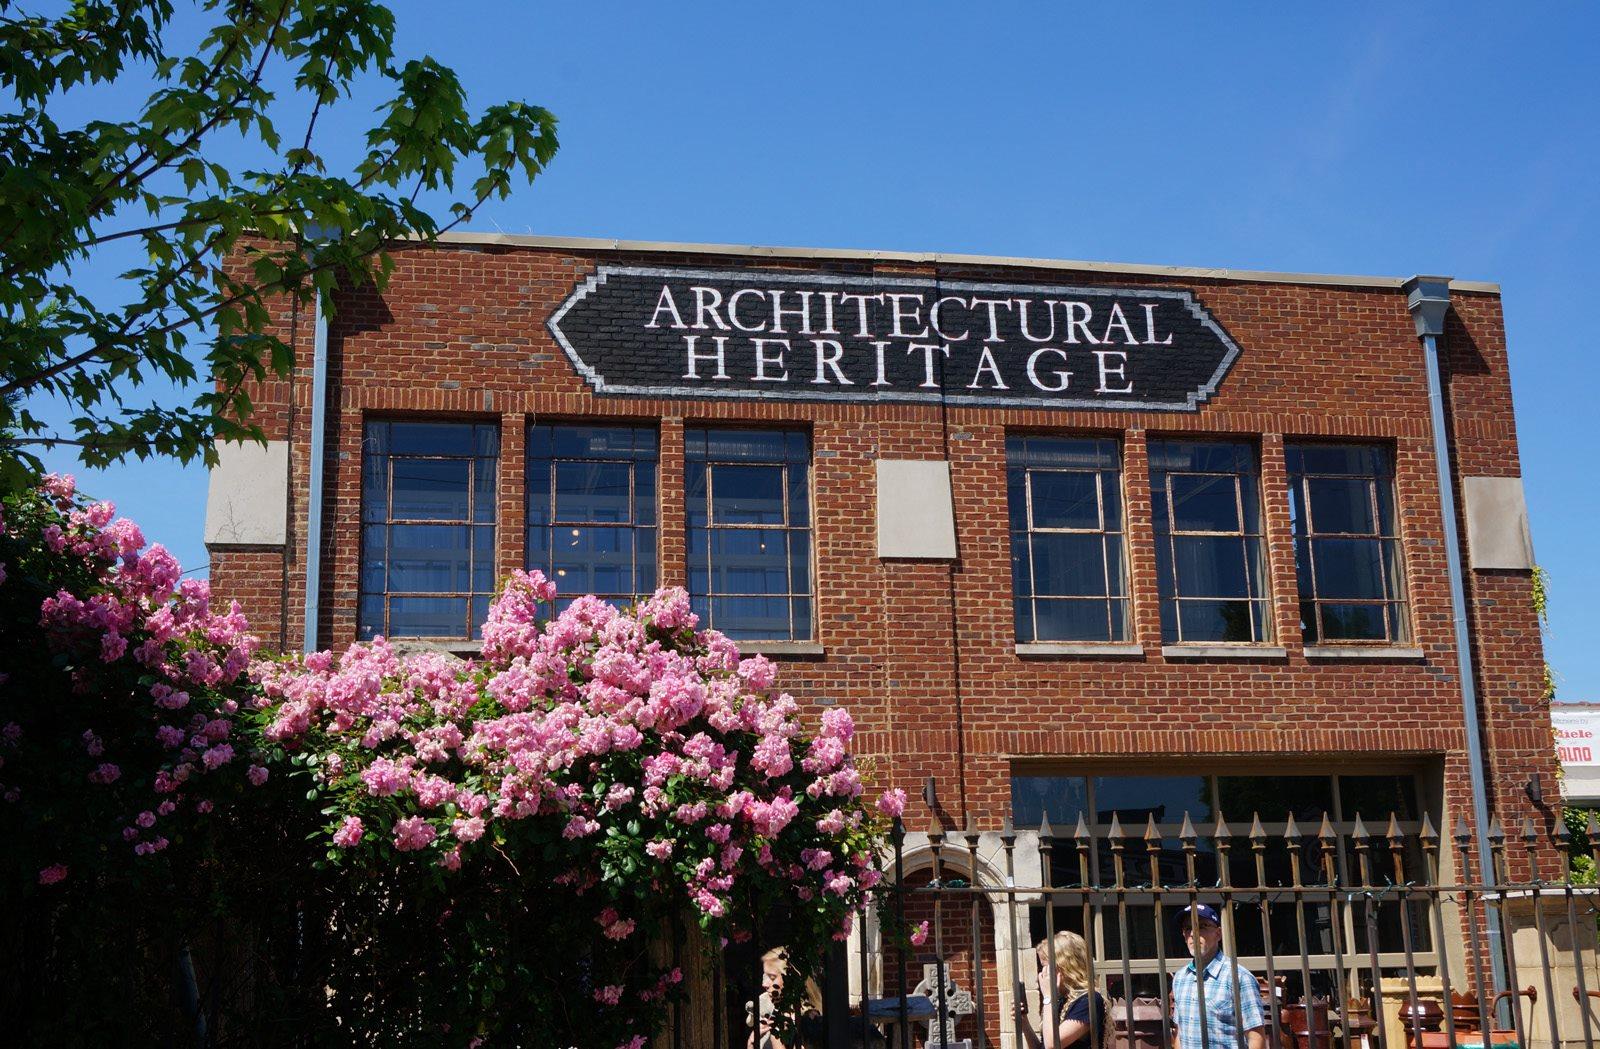 birmingham al sites and attractions